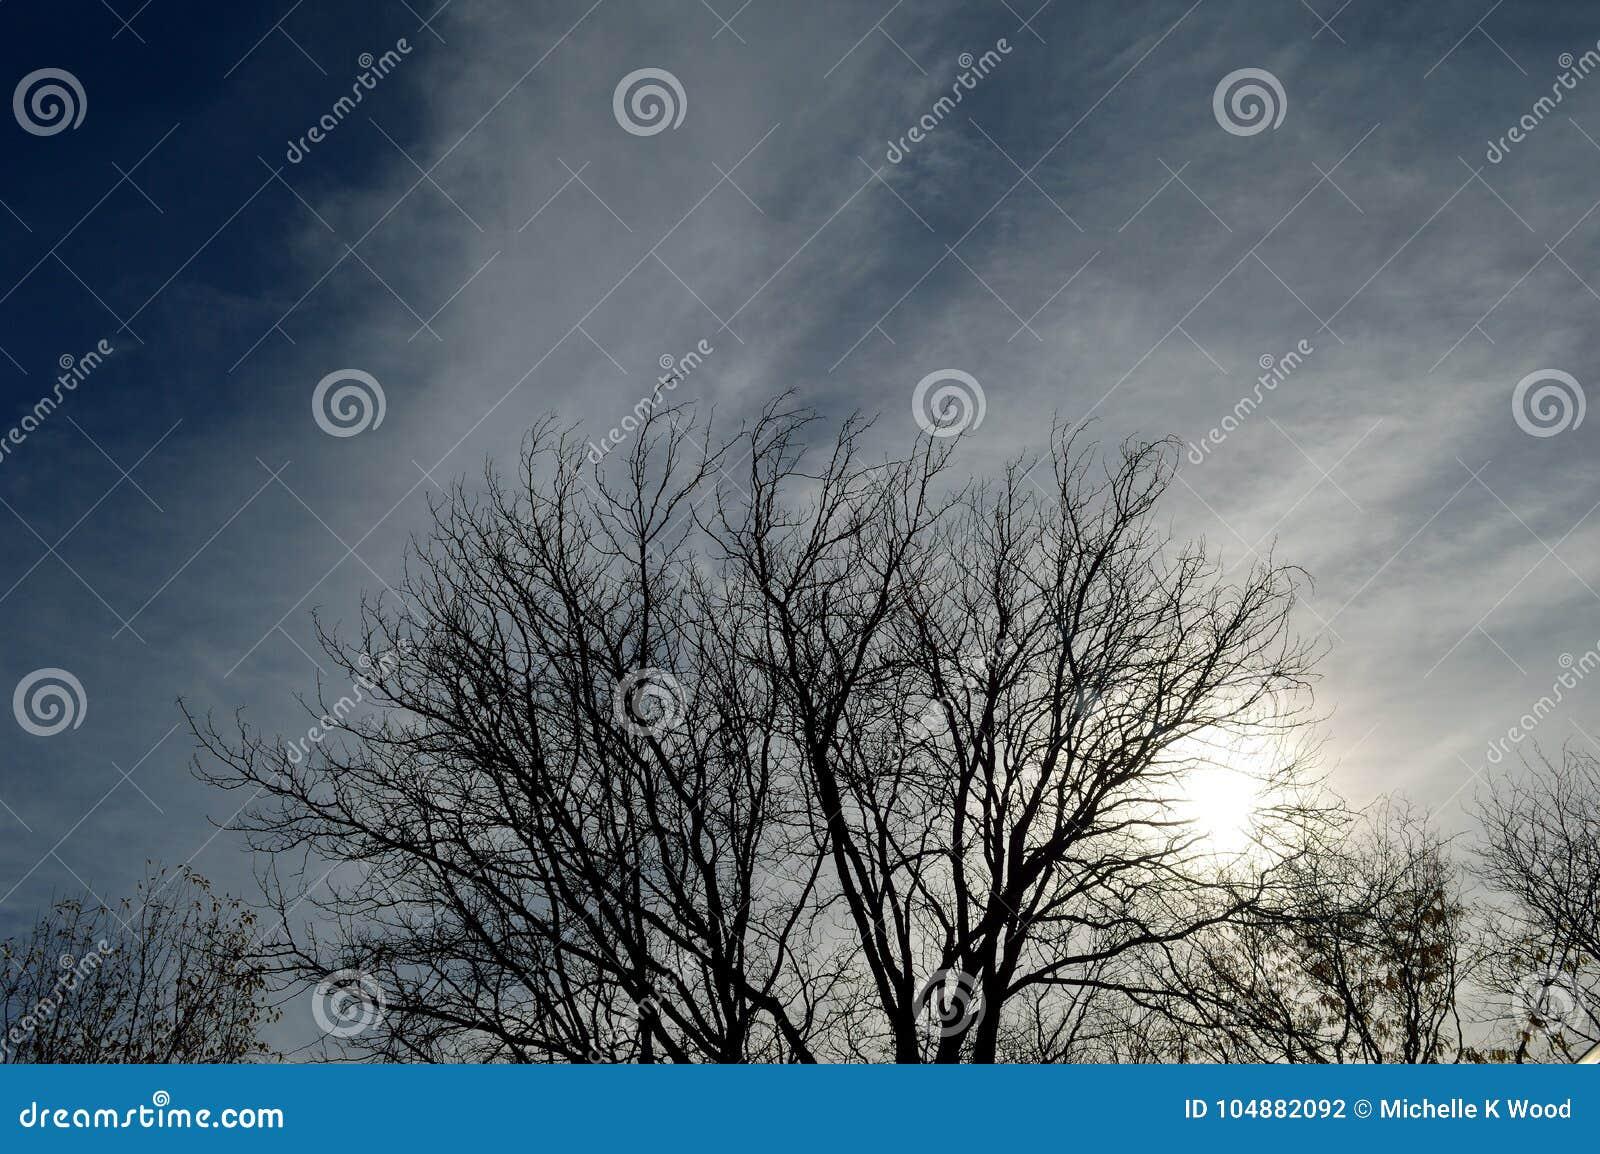 Tree silhouette cloudy stormy sky